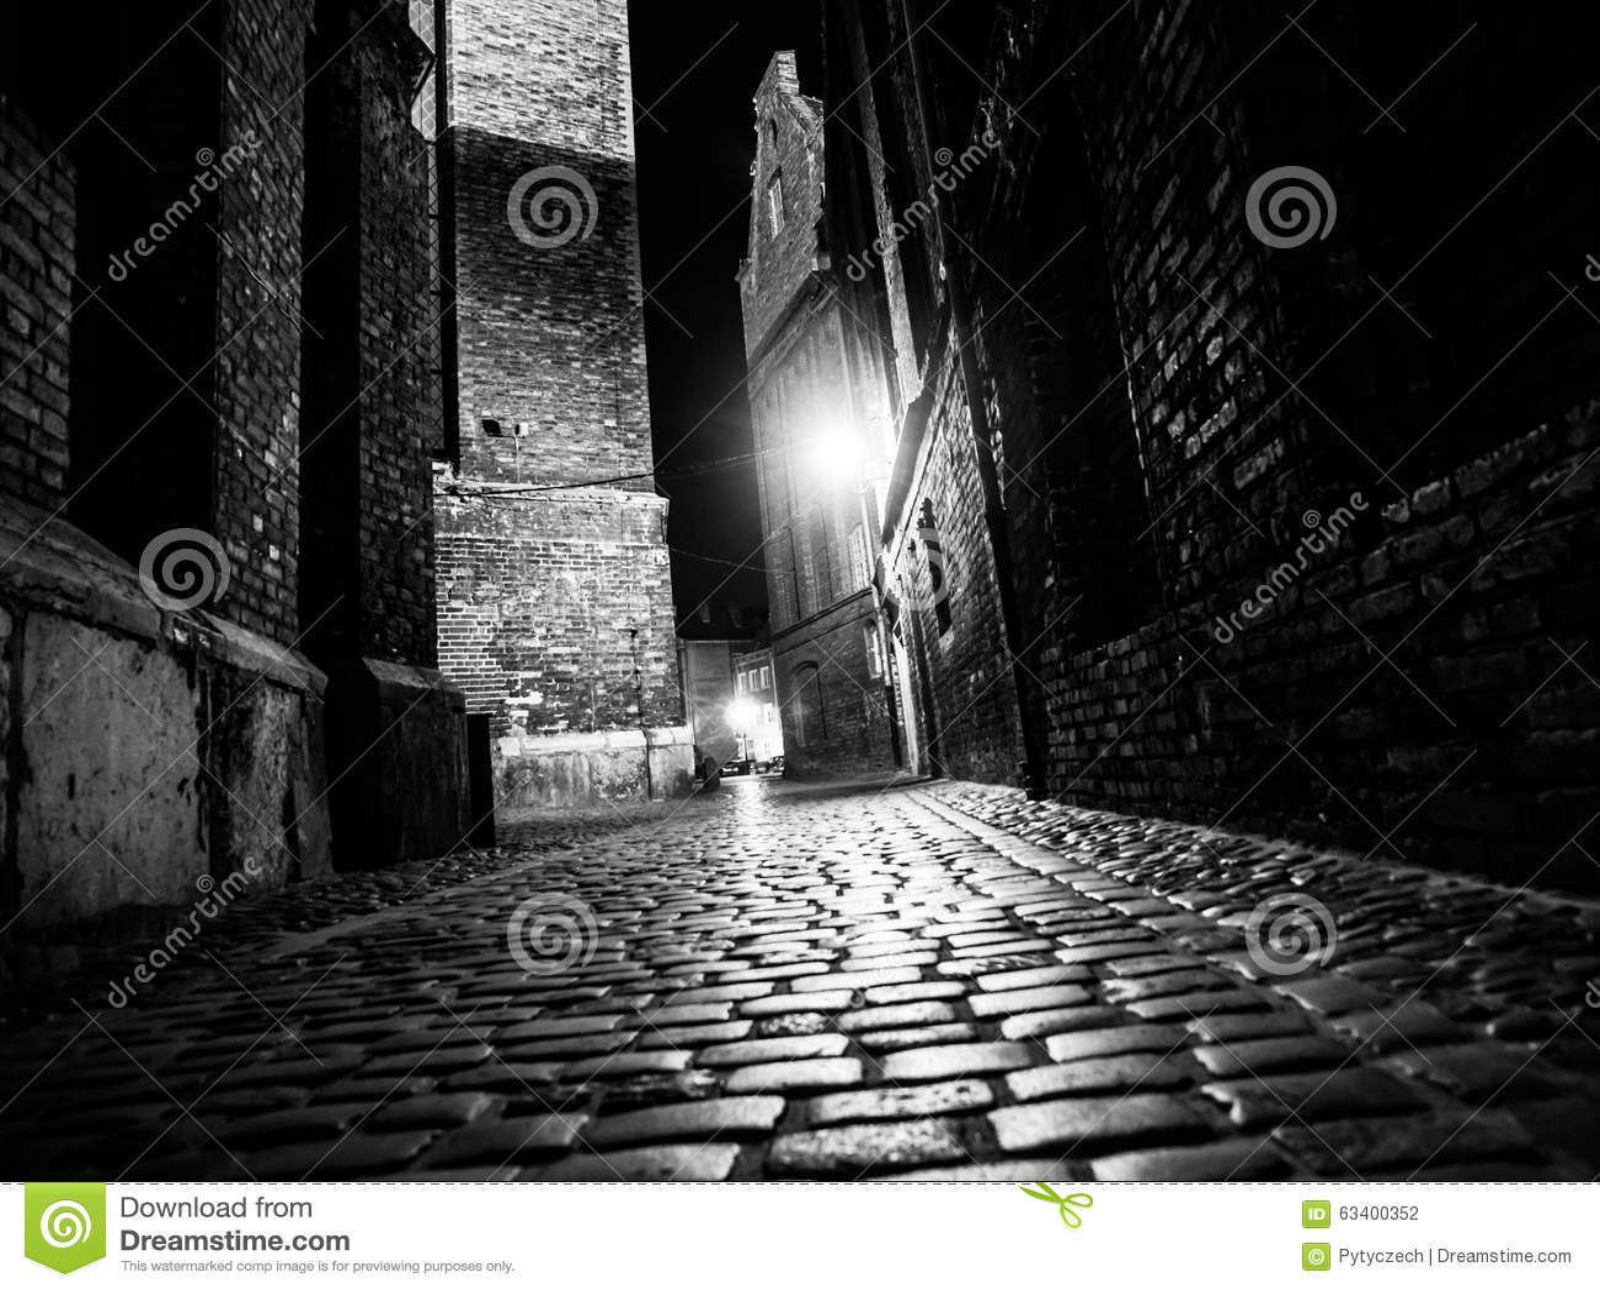 0adea115a7a Φωτισμένος η οδός με τις ελαφριές αντανακλάσεις στους κυβόλινθους στην  παλαιά ιστορική πόλη τή νύχτα Γραπτή εικόνα